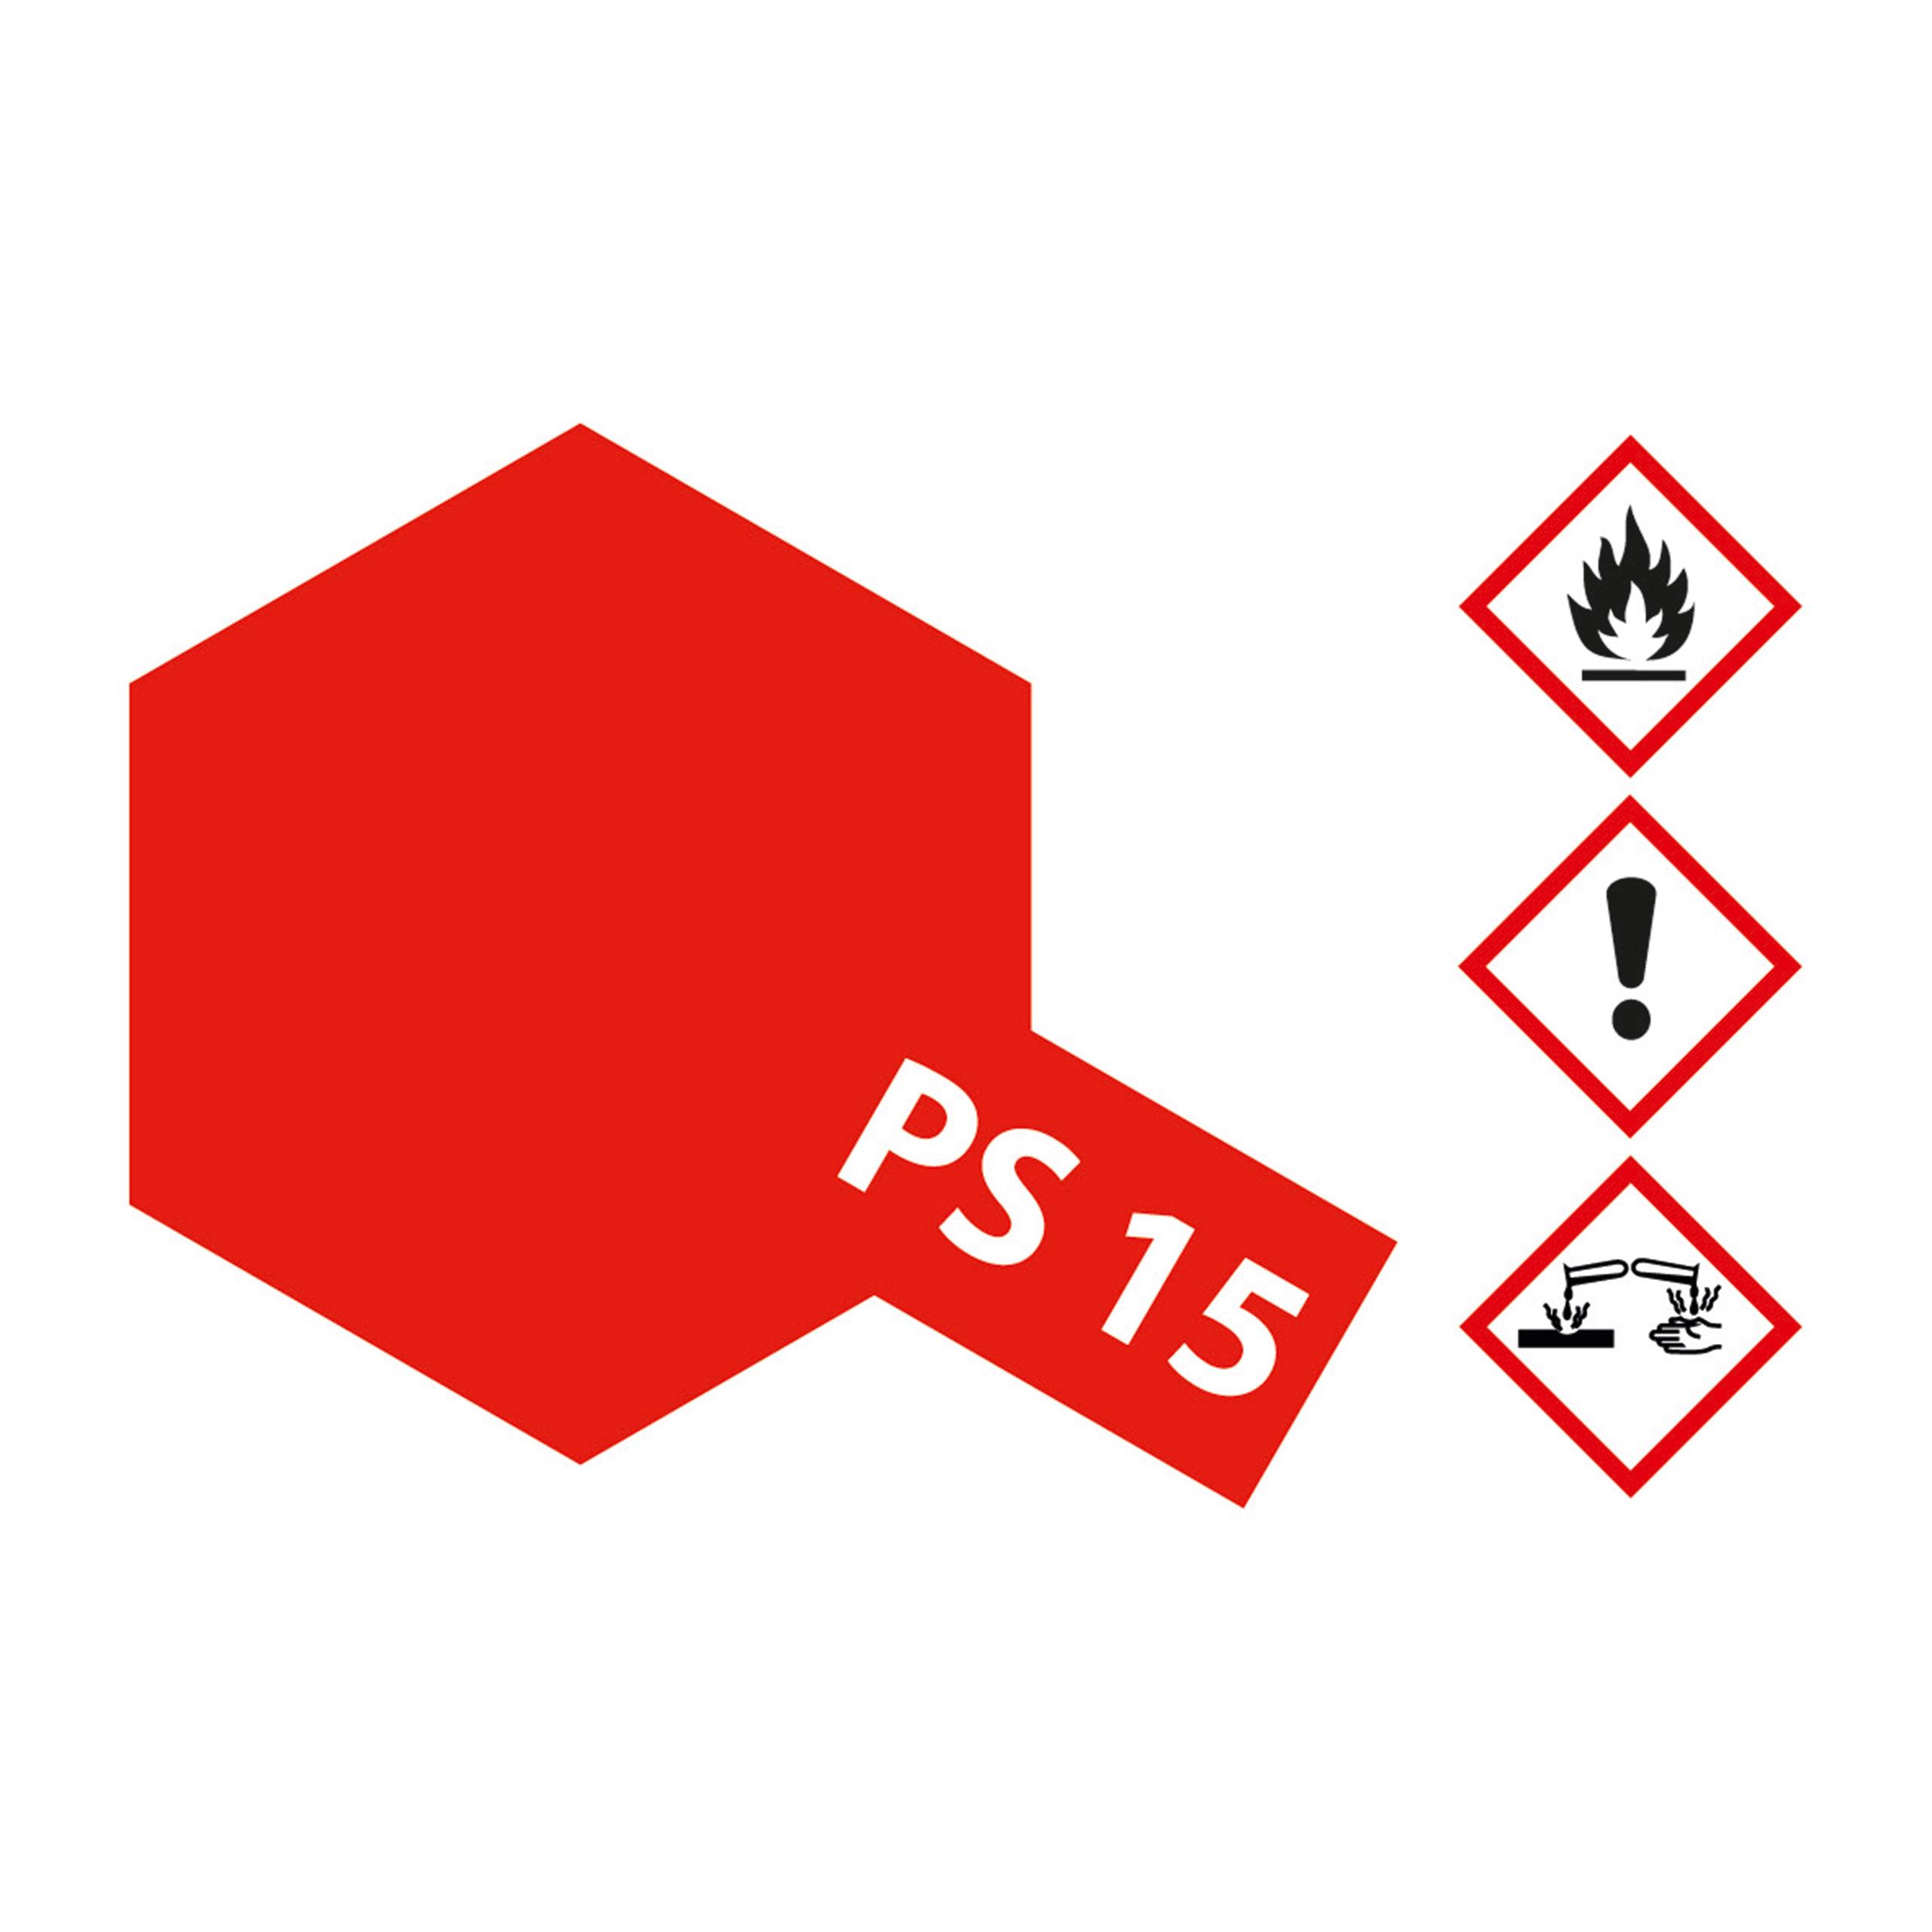 PS-15 Metallic Rot Polycarbonat - 100ml Sprayfarbe Lexan - Tamiya 300086015